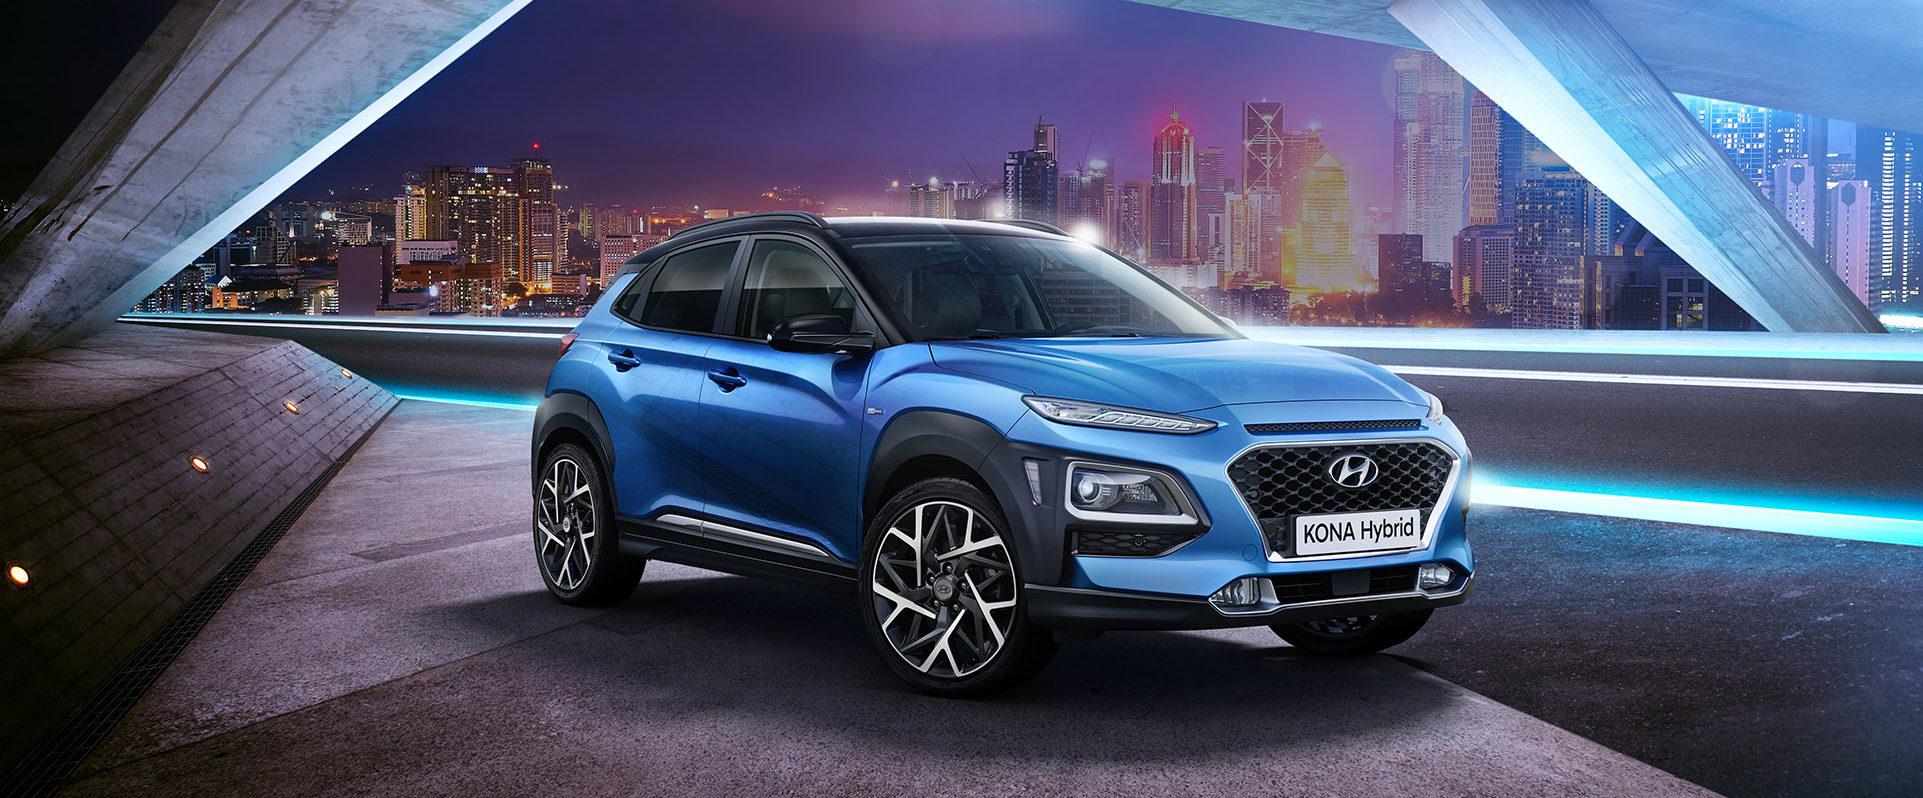 Nuova Hyundai Kona Hybrid tua a 22.600€